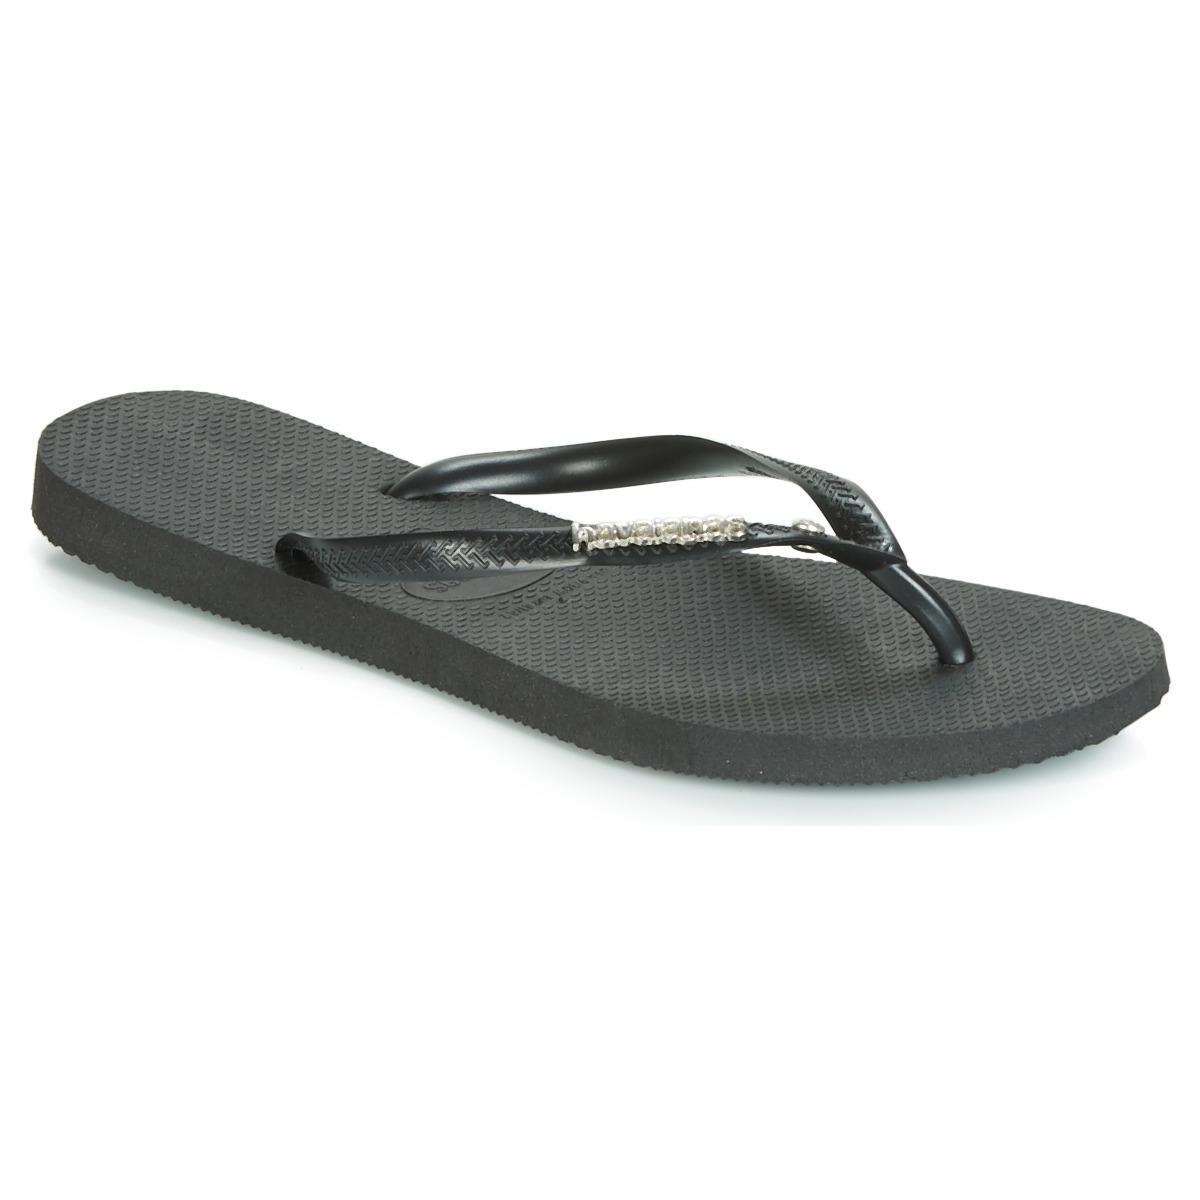 dc2f411240f0 Havaianas Slim Logo Metallic Crystal Flip Flops   Sandals (shoes) in ...